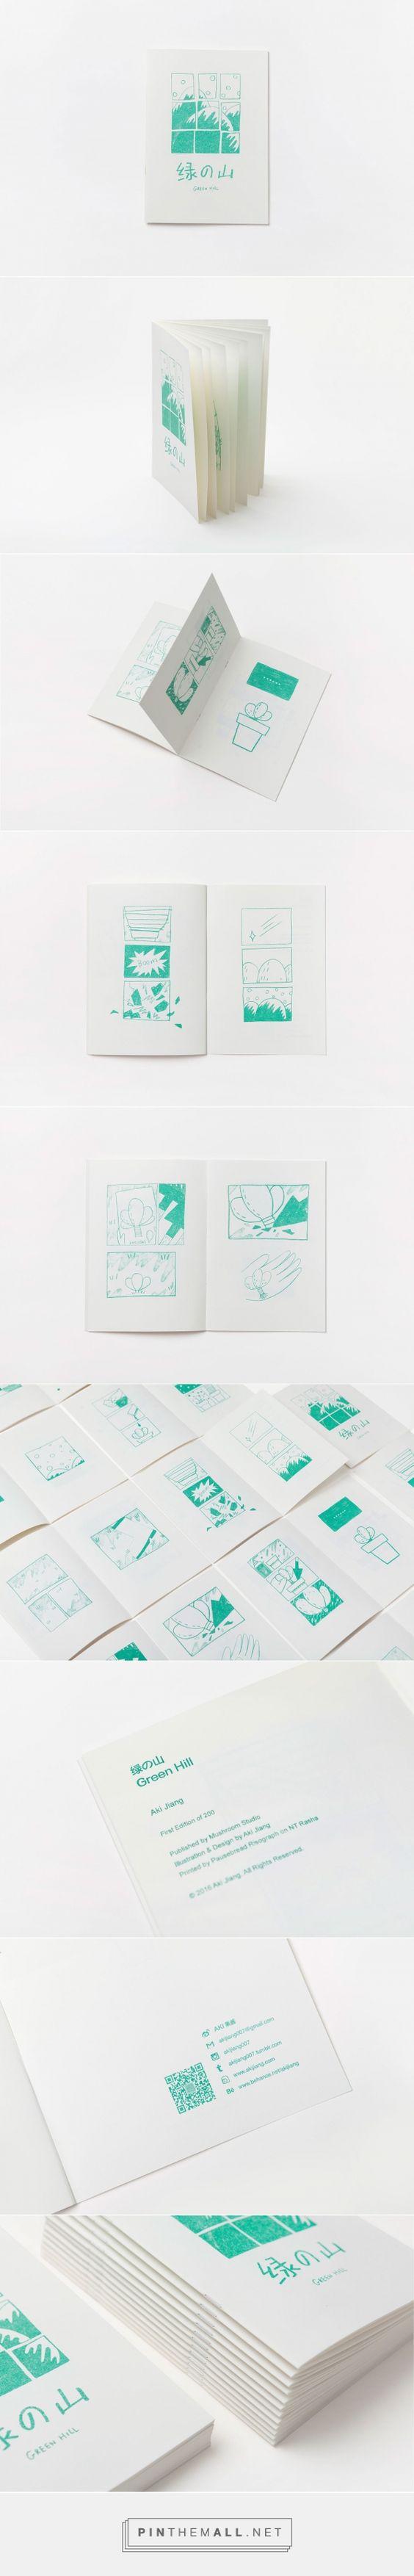 Self-Publishing Zine-Green Hill /自出版Zine《绿の山》 on Behance - created via https://pinthemall.net: